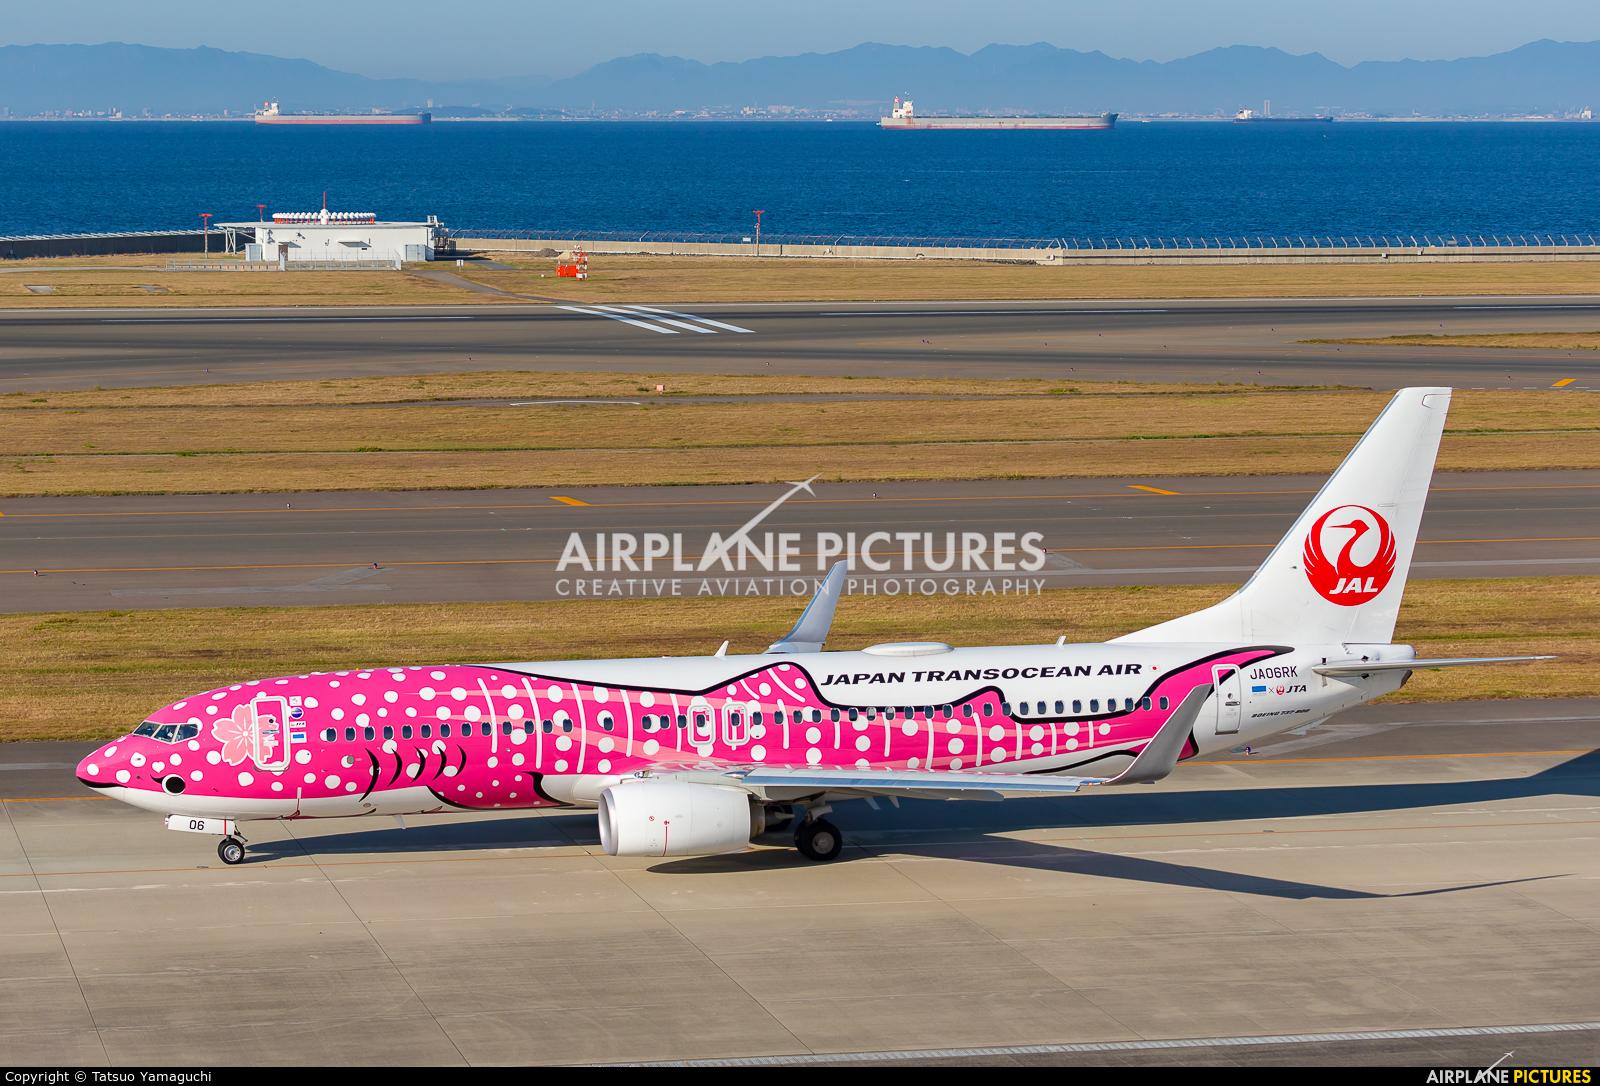 JAL - Japan Transocean Air JA06RK aircraft at Chubu Centrair Intl